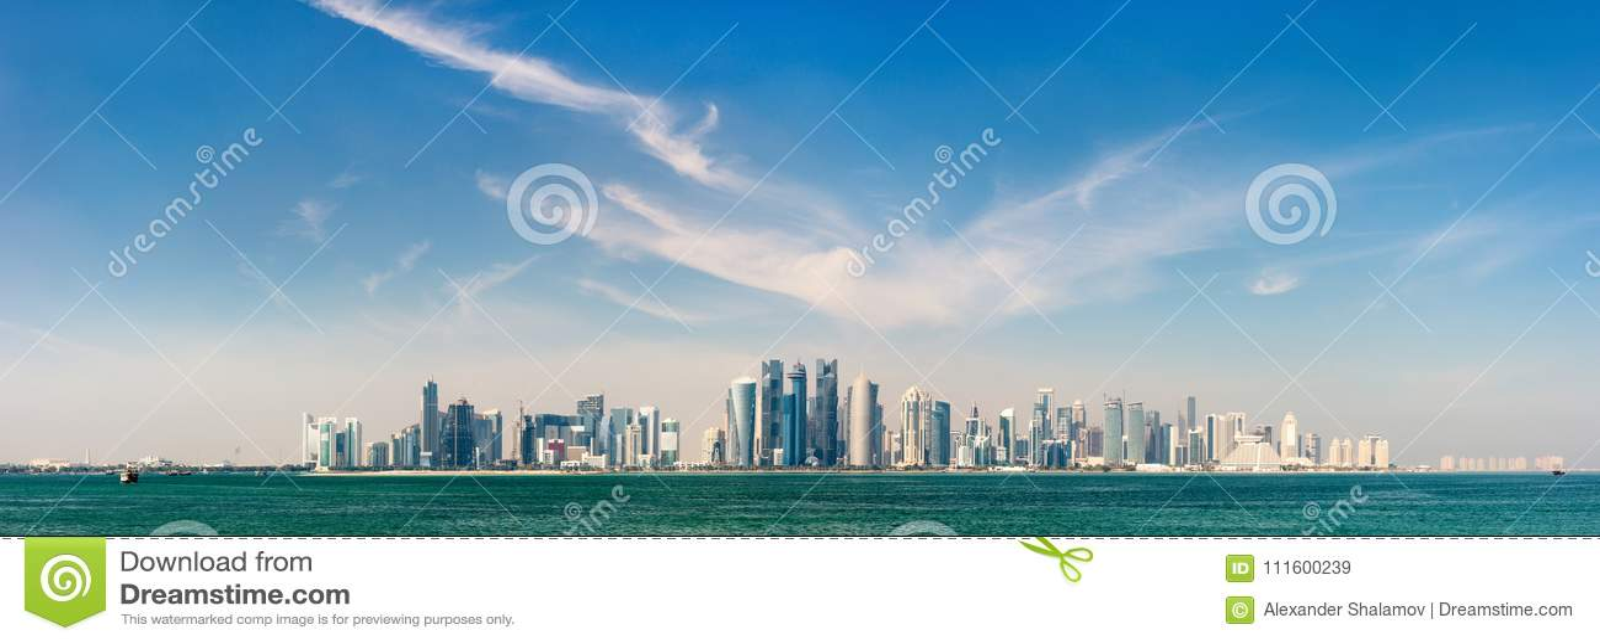 Горизонт Дохи Катара